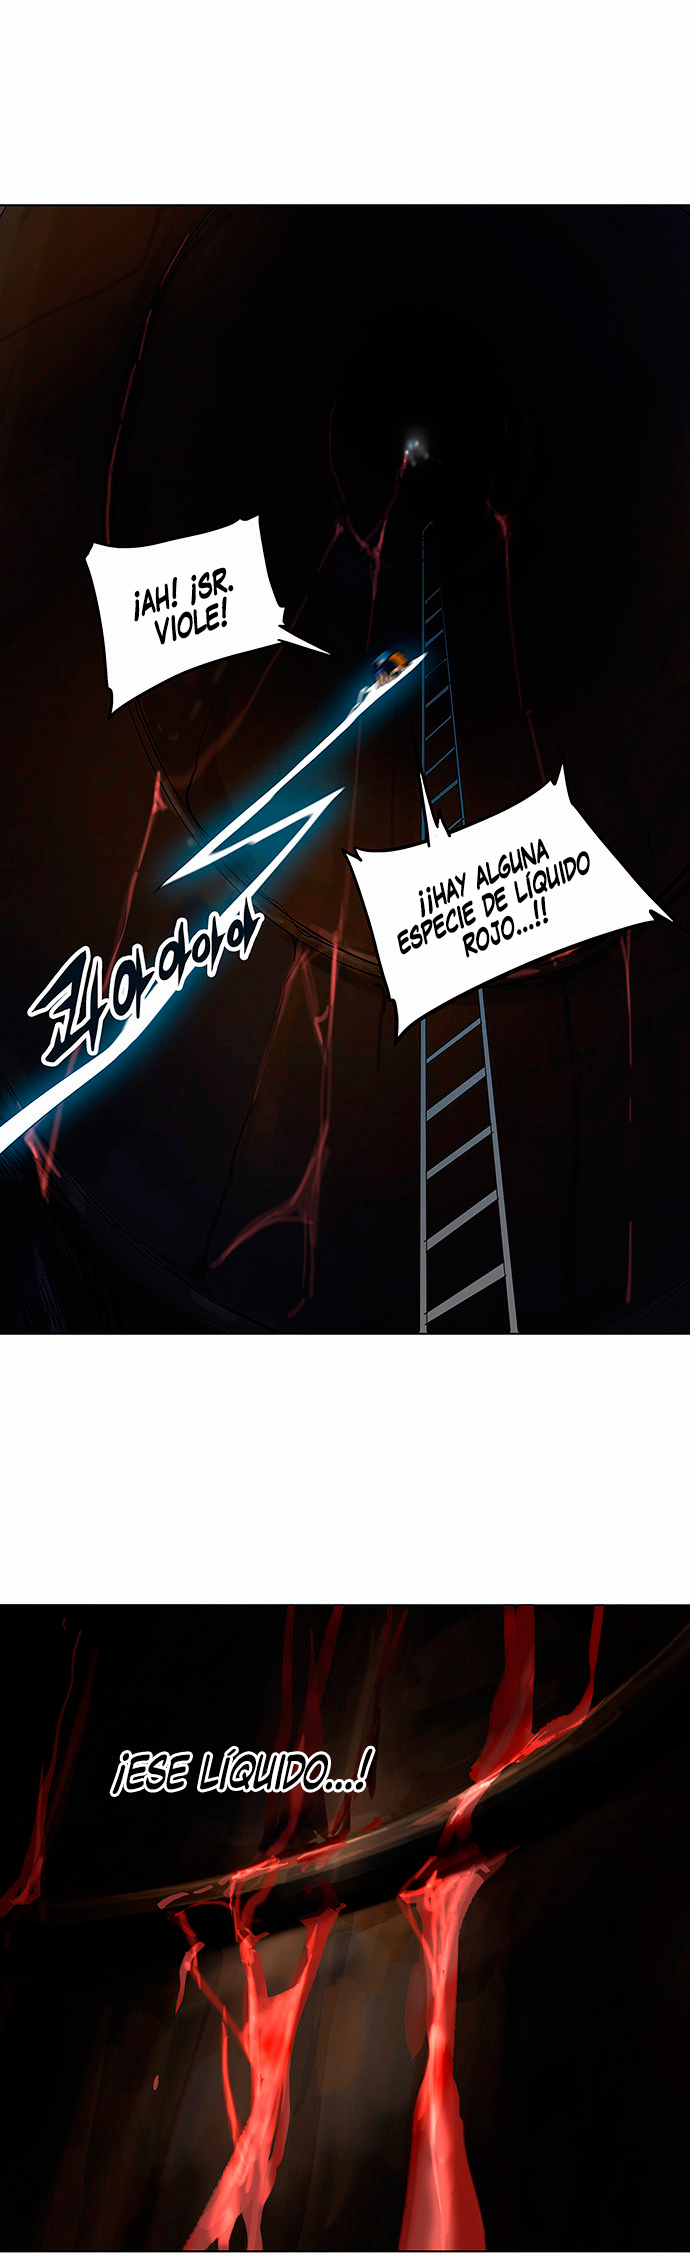 http://c5.ninemanga.com/es_manga/21/149/436546/26927c12b1f71e3e4b13b550305bb8c5.jpg Page 2